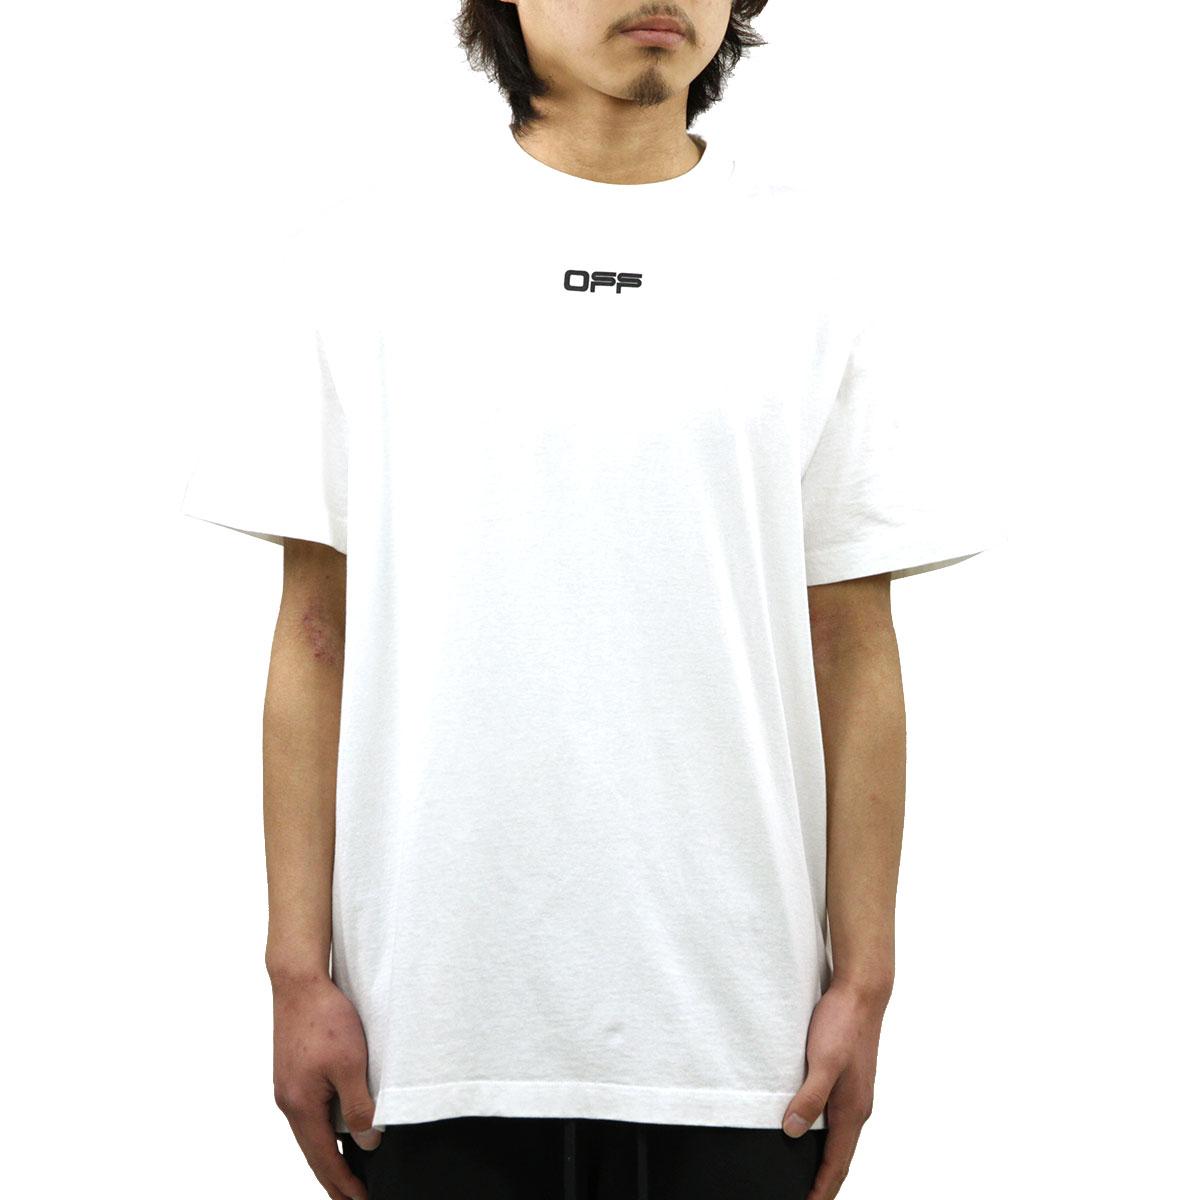 off-white_1